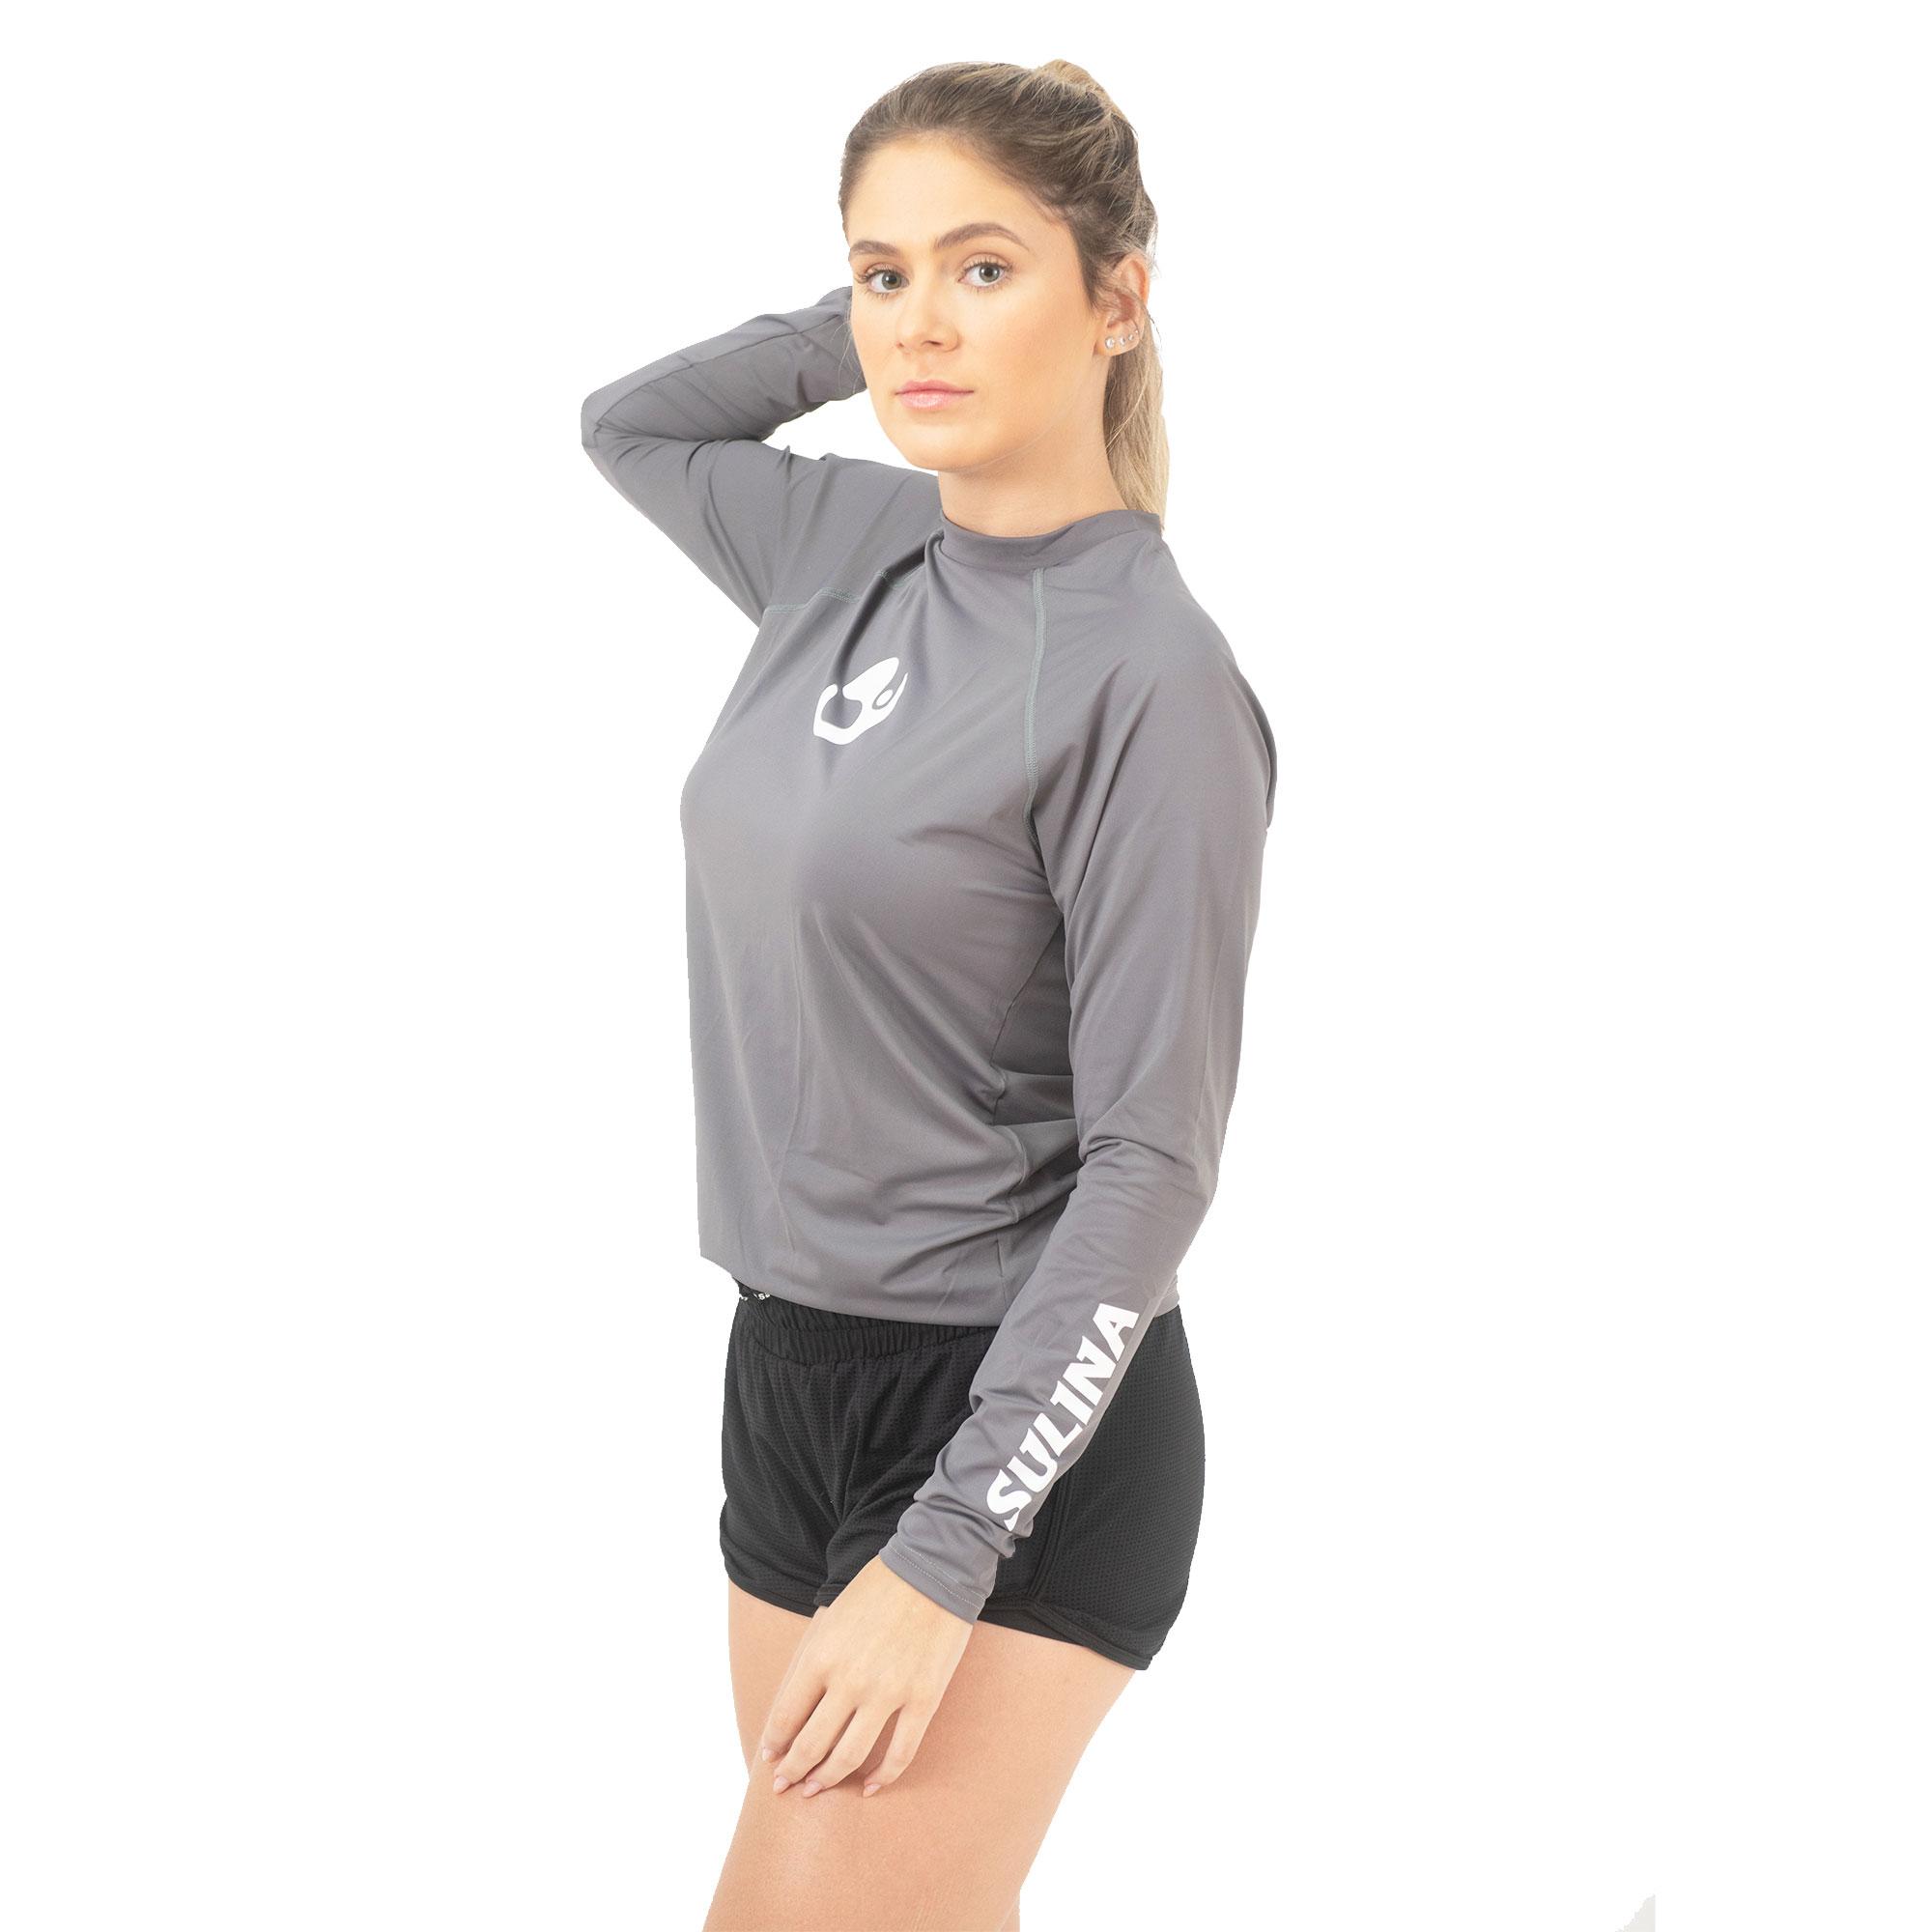 Camiseta Sulina Manga Longa UV 50+  Térmica Cinza